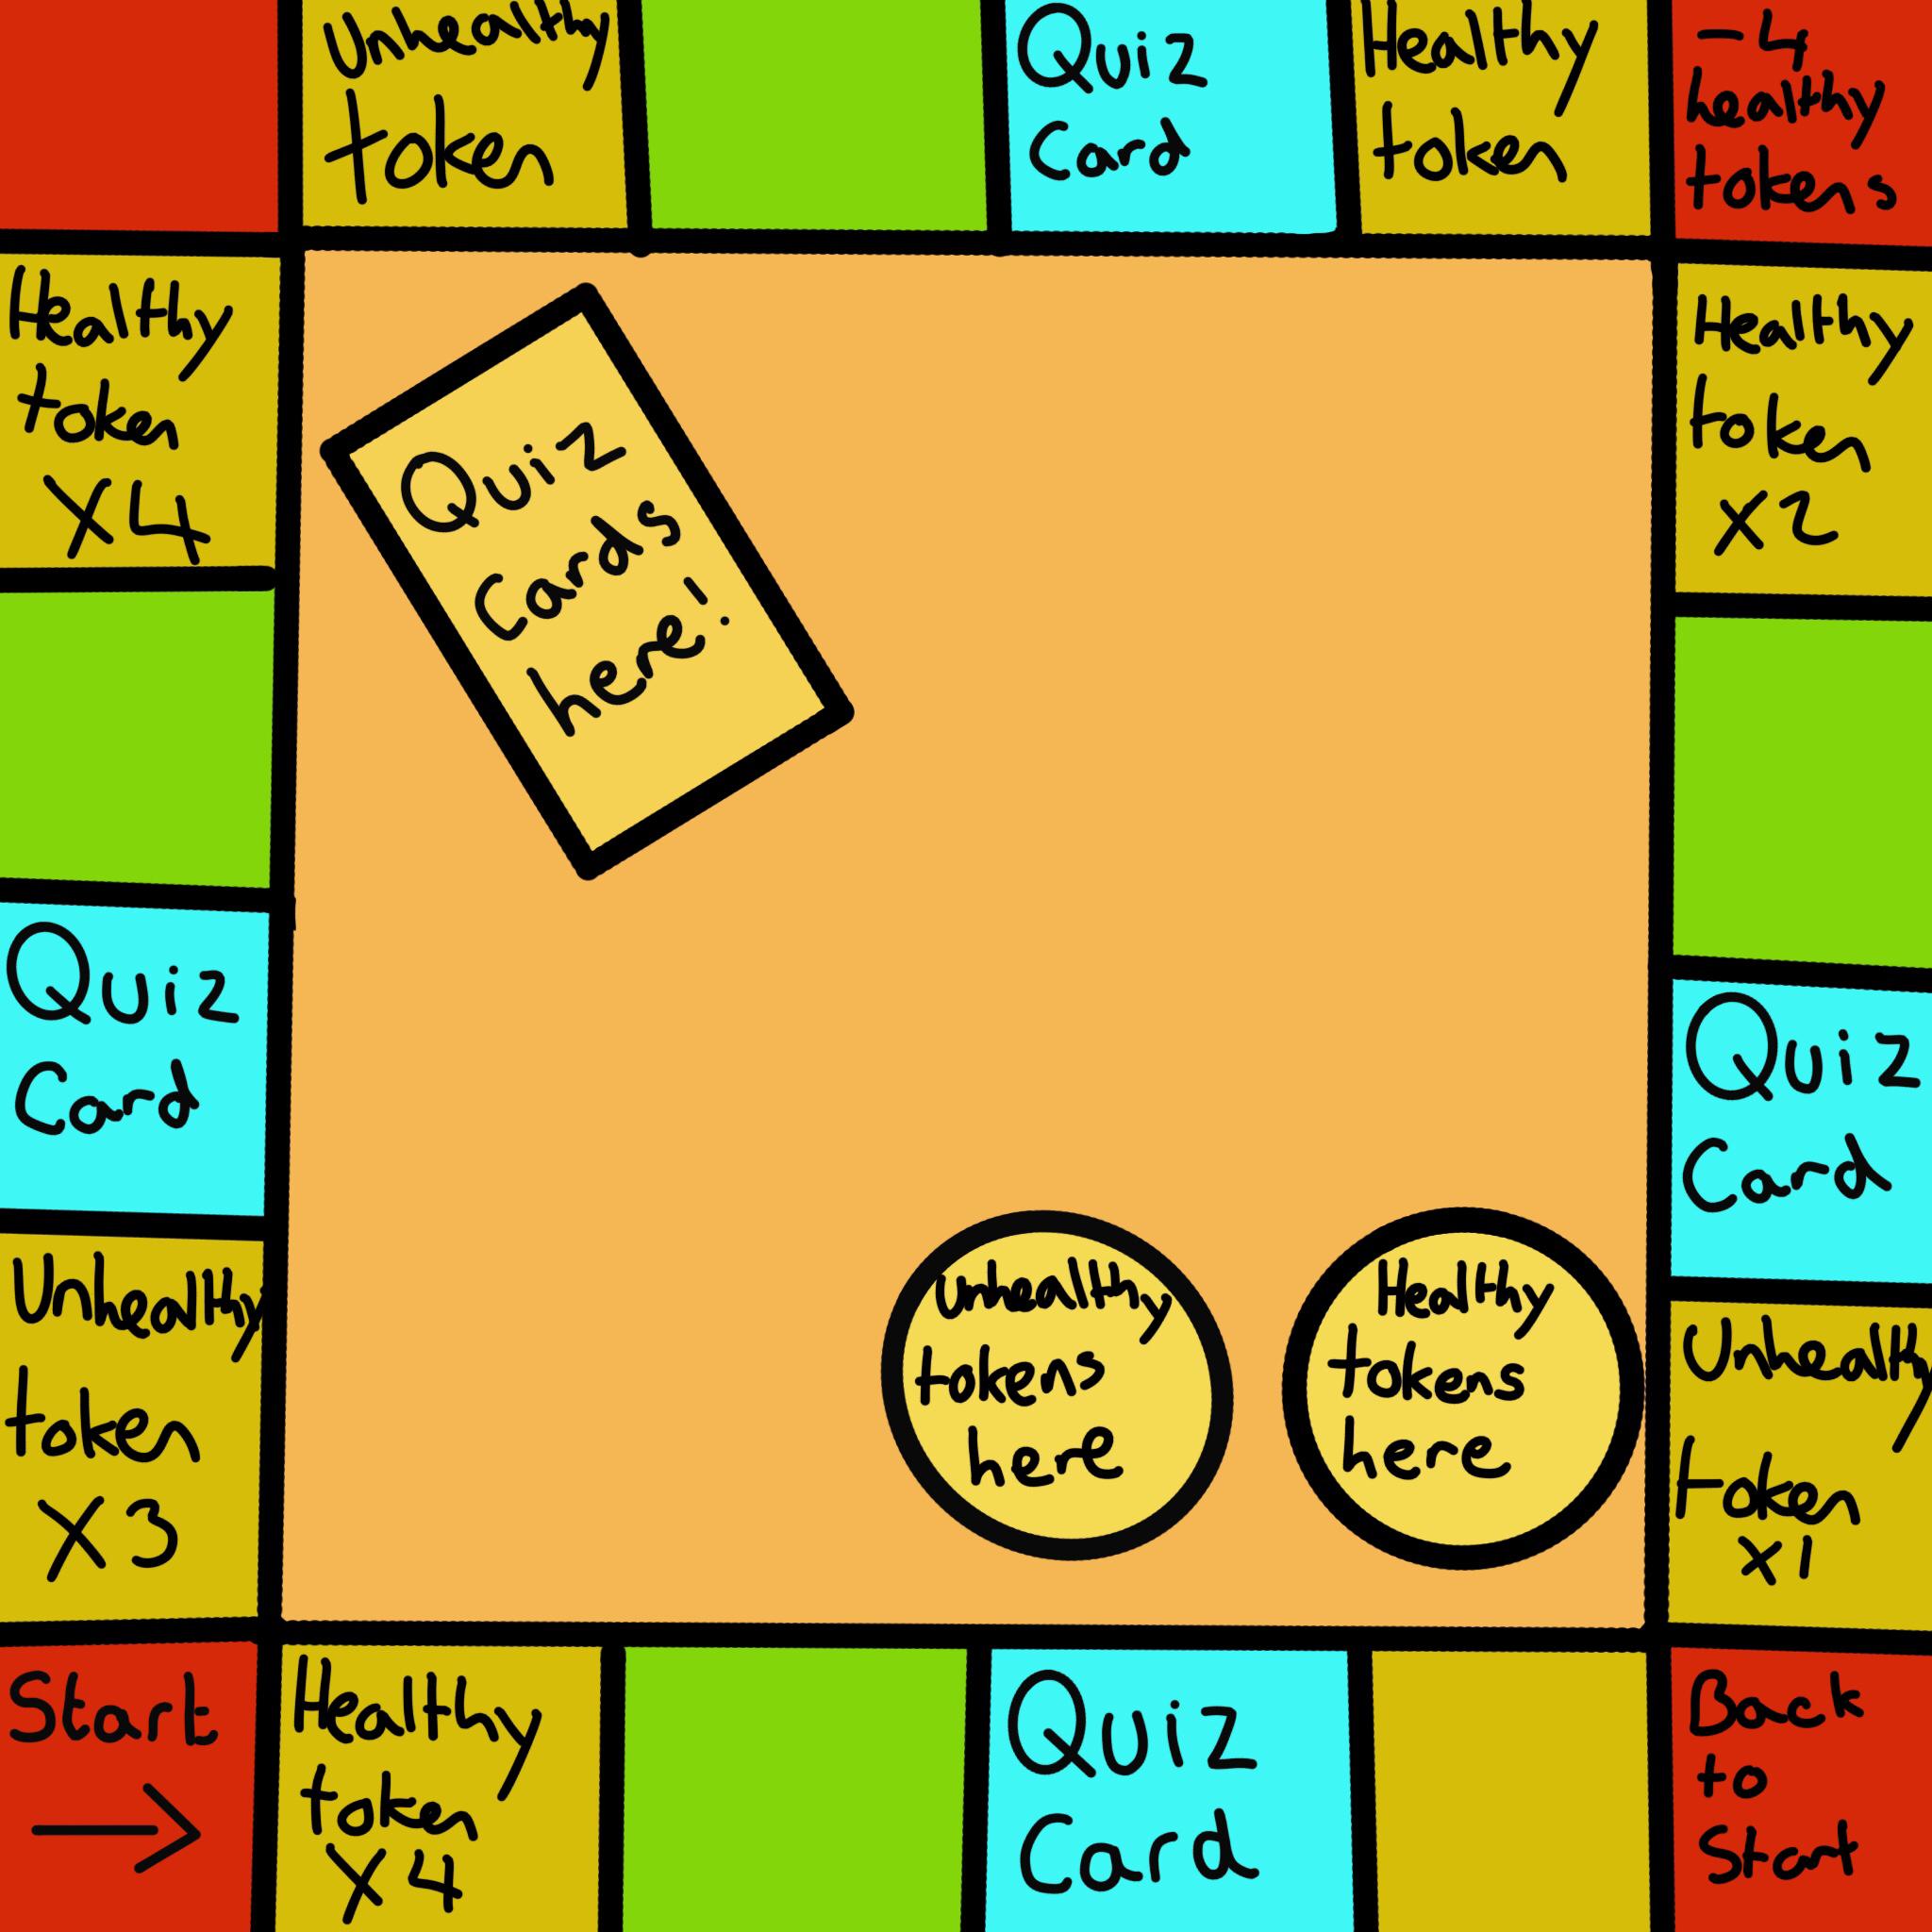 08/06/20 - Board Game